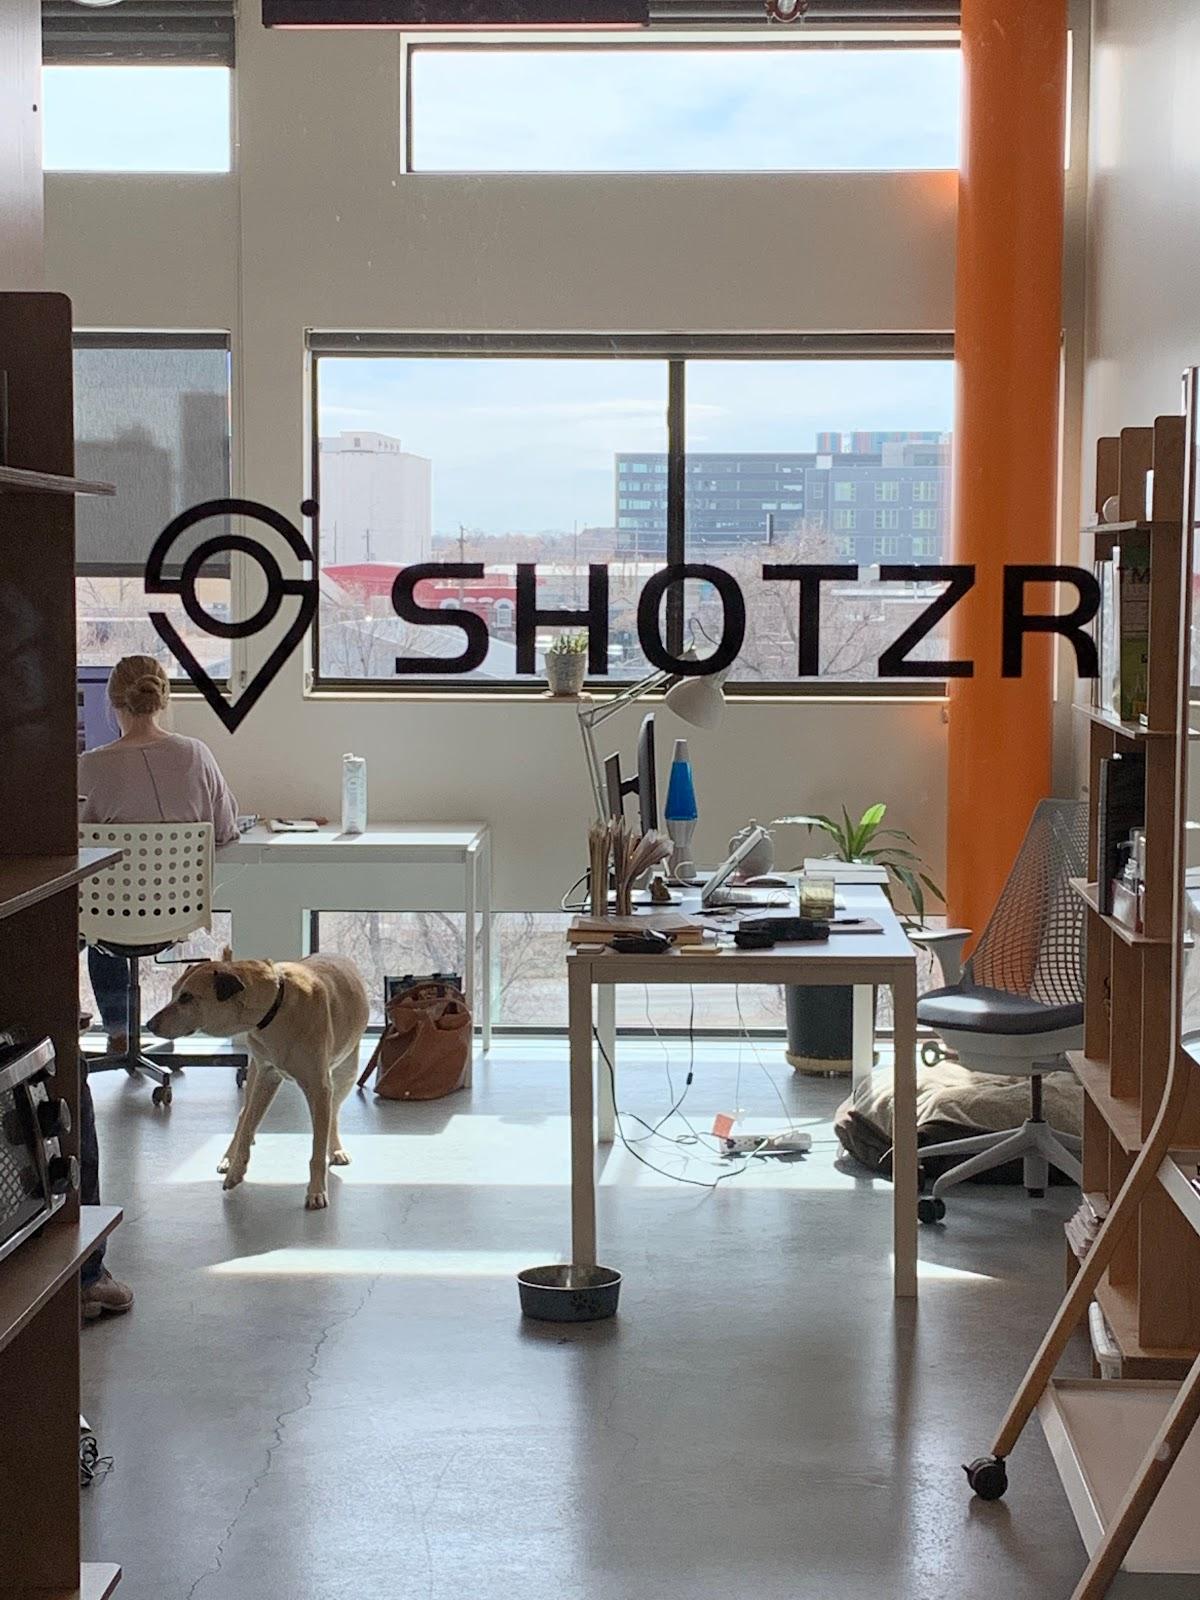 The Shotzr office